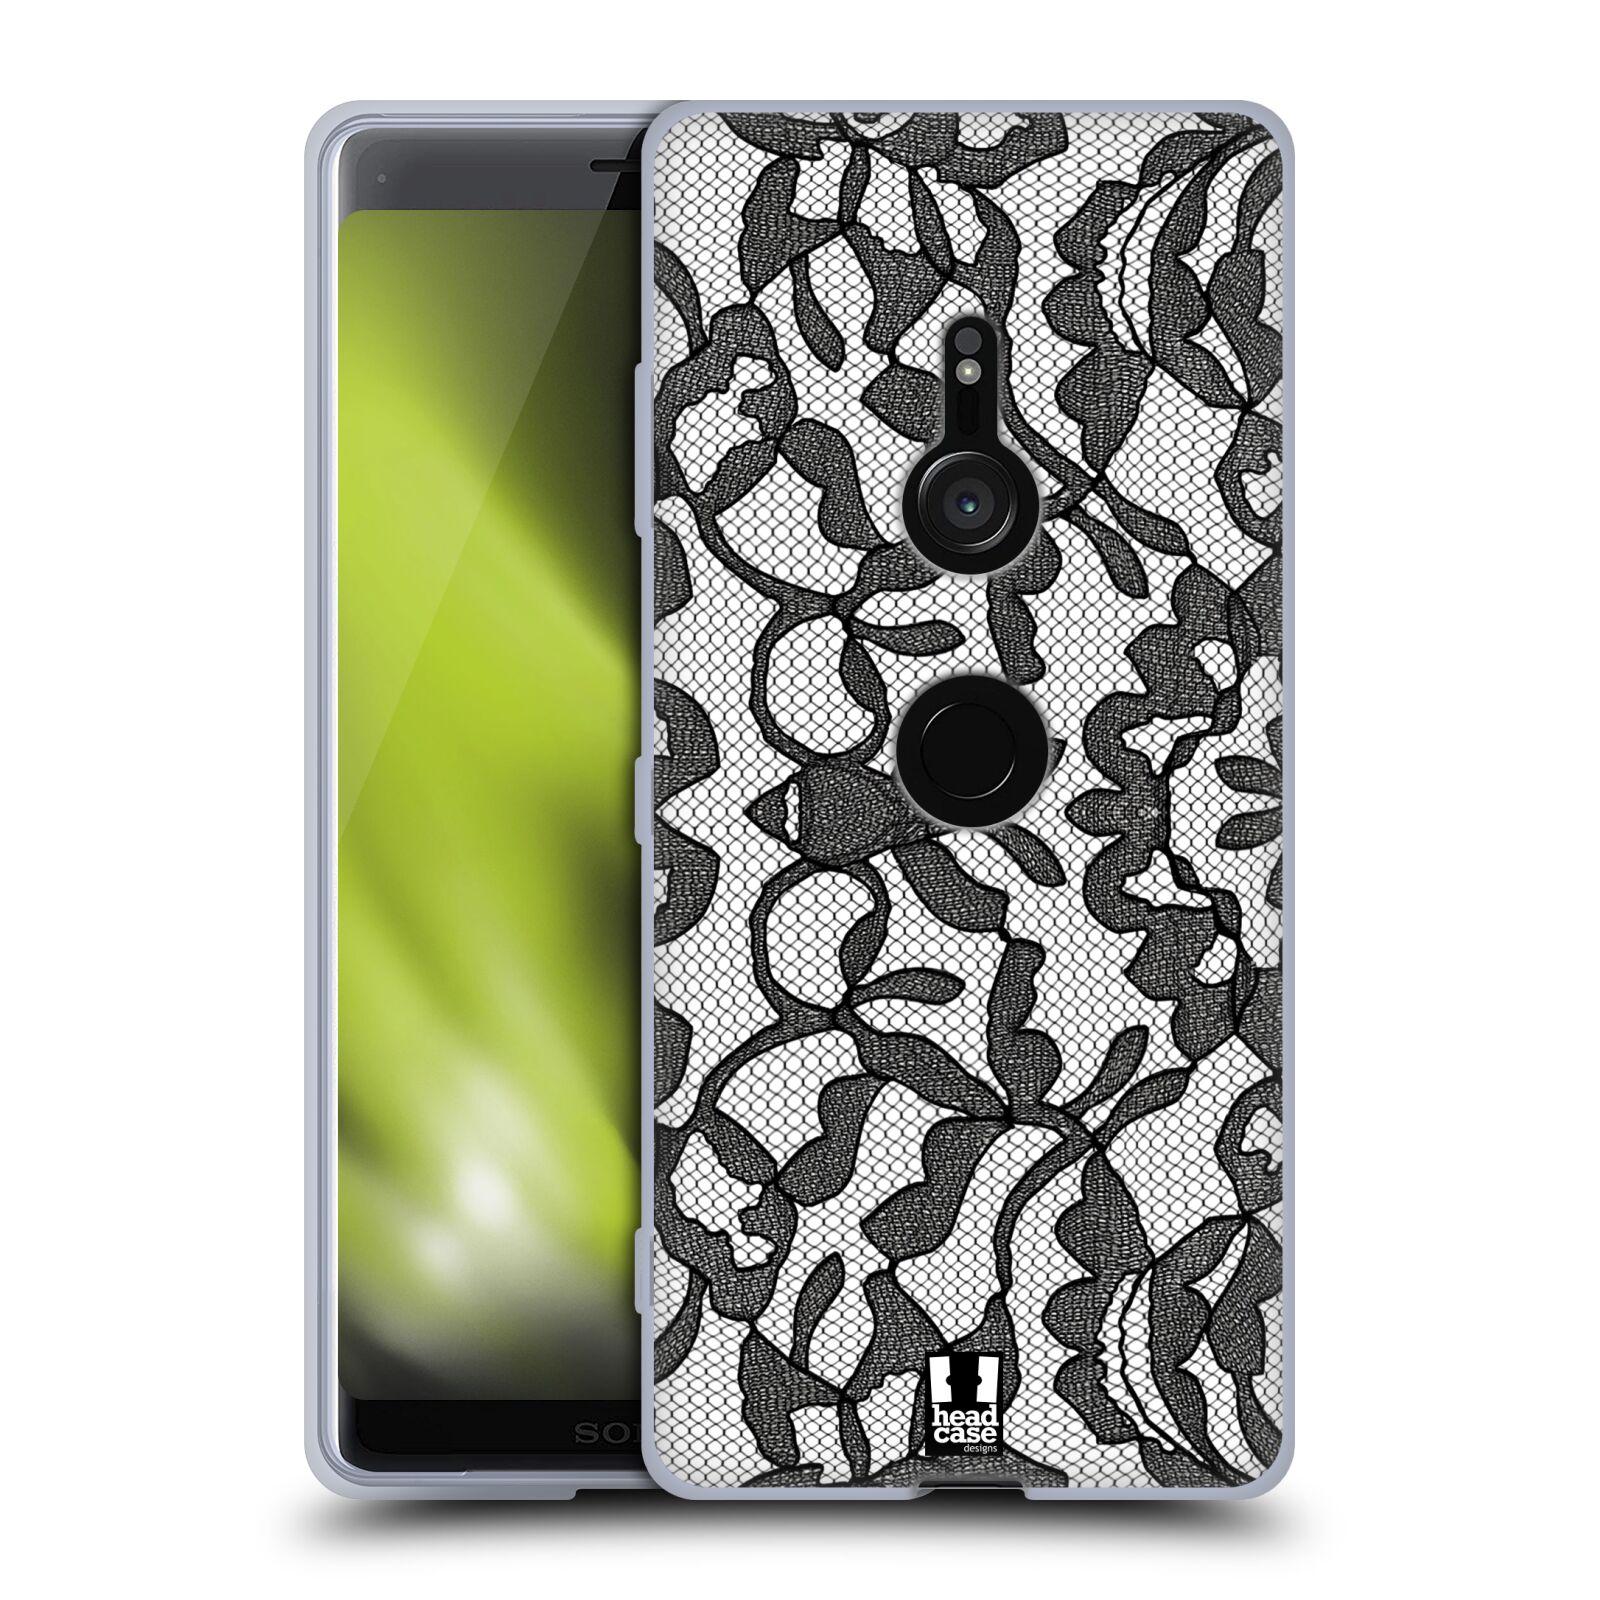 Silikonové pouzdro na mobil Sony Xperia XZ3 - Head Case - LEAFY KRAJKA